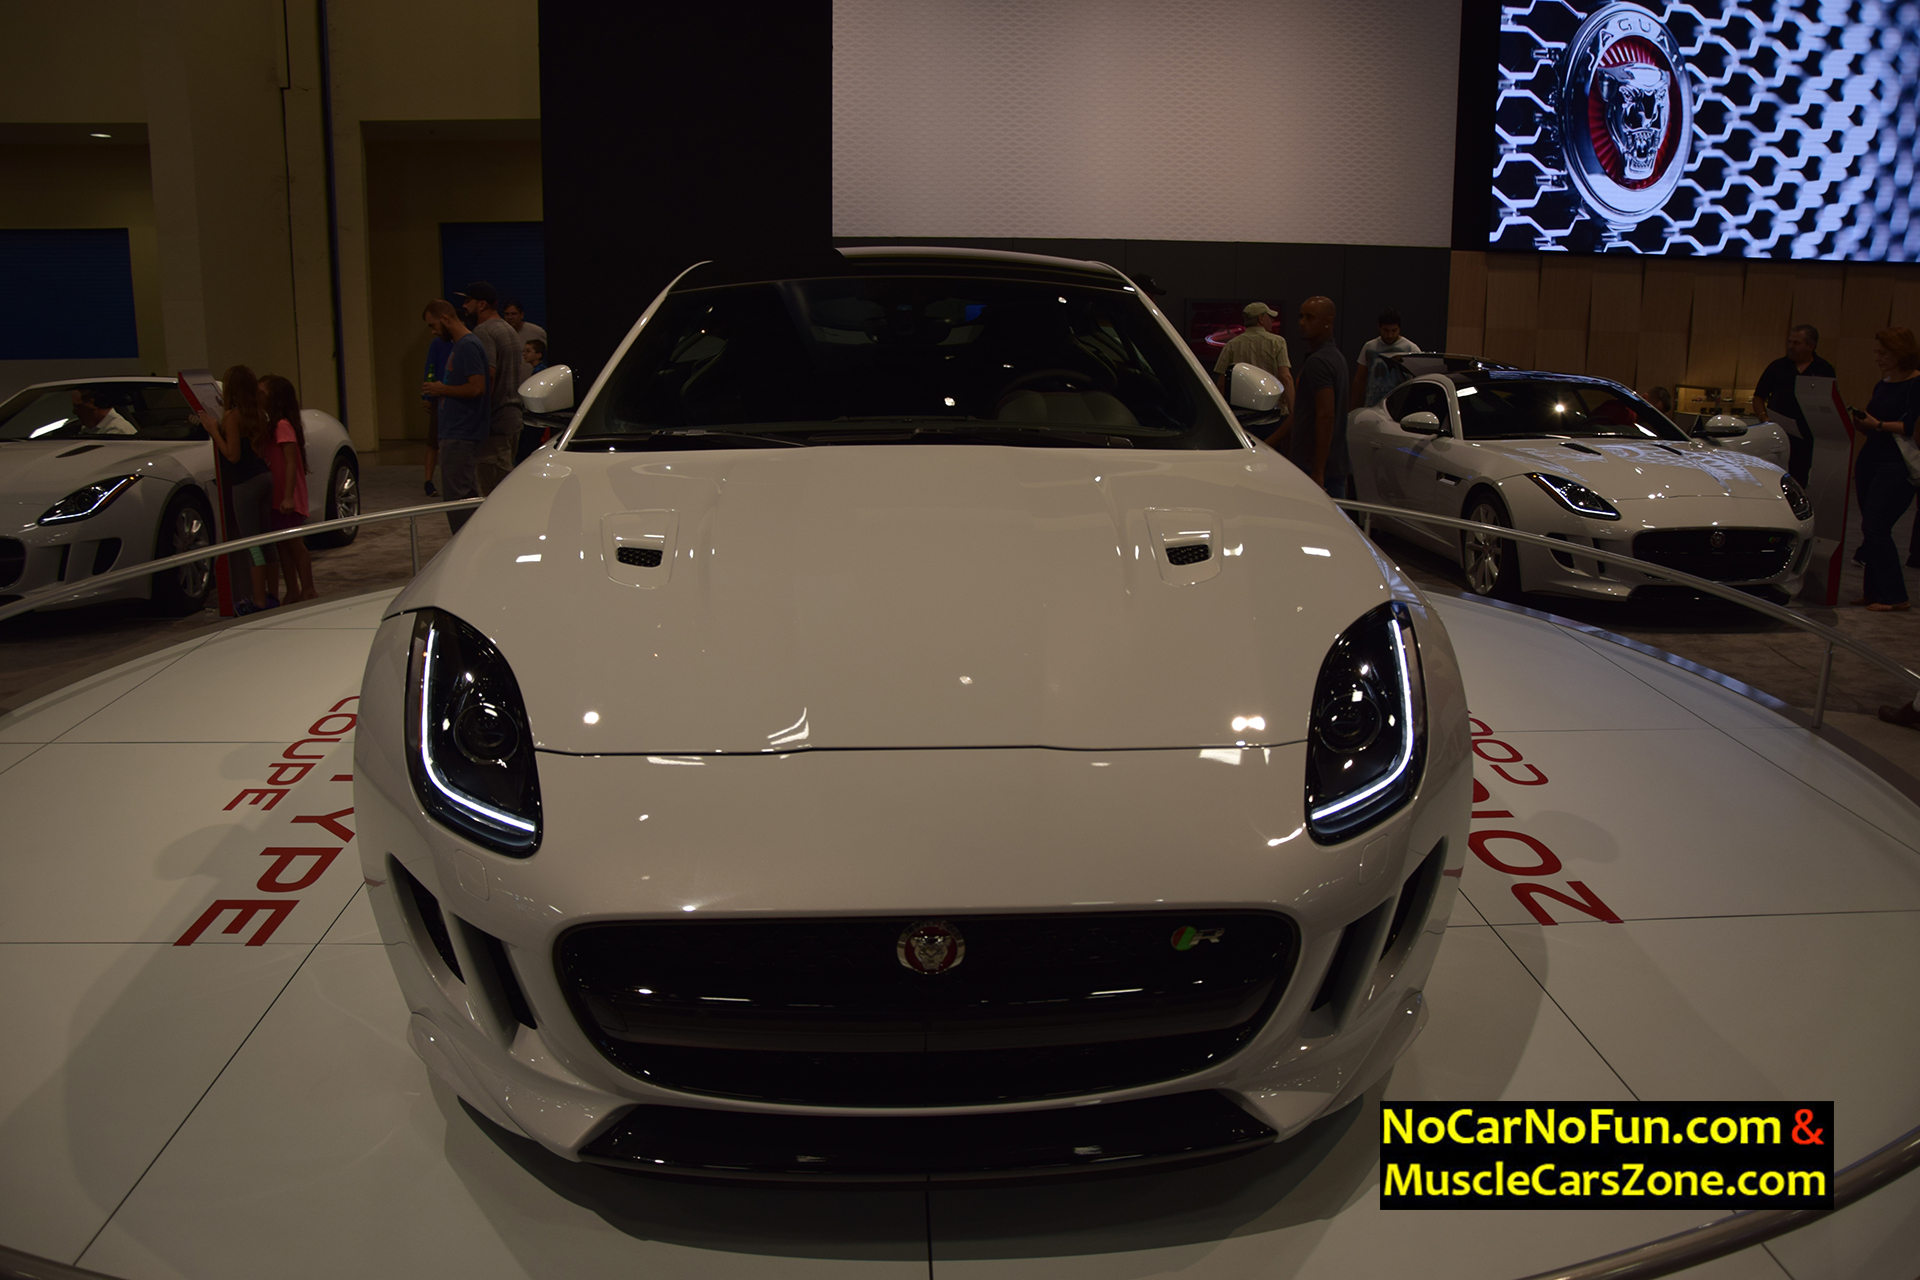 2016 Jaguar F-Type Coupe - Miami Auto Show 2015 7 - Muscle Cars Zone!